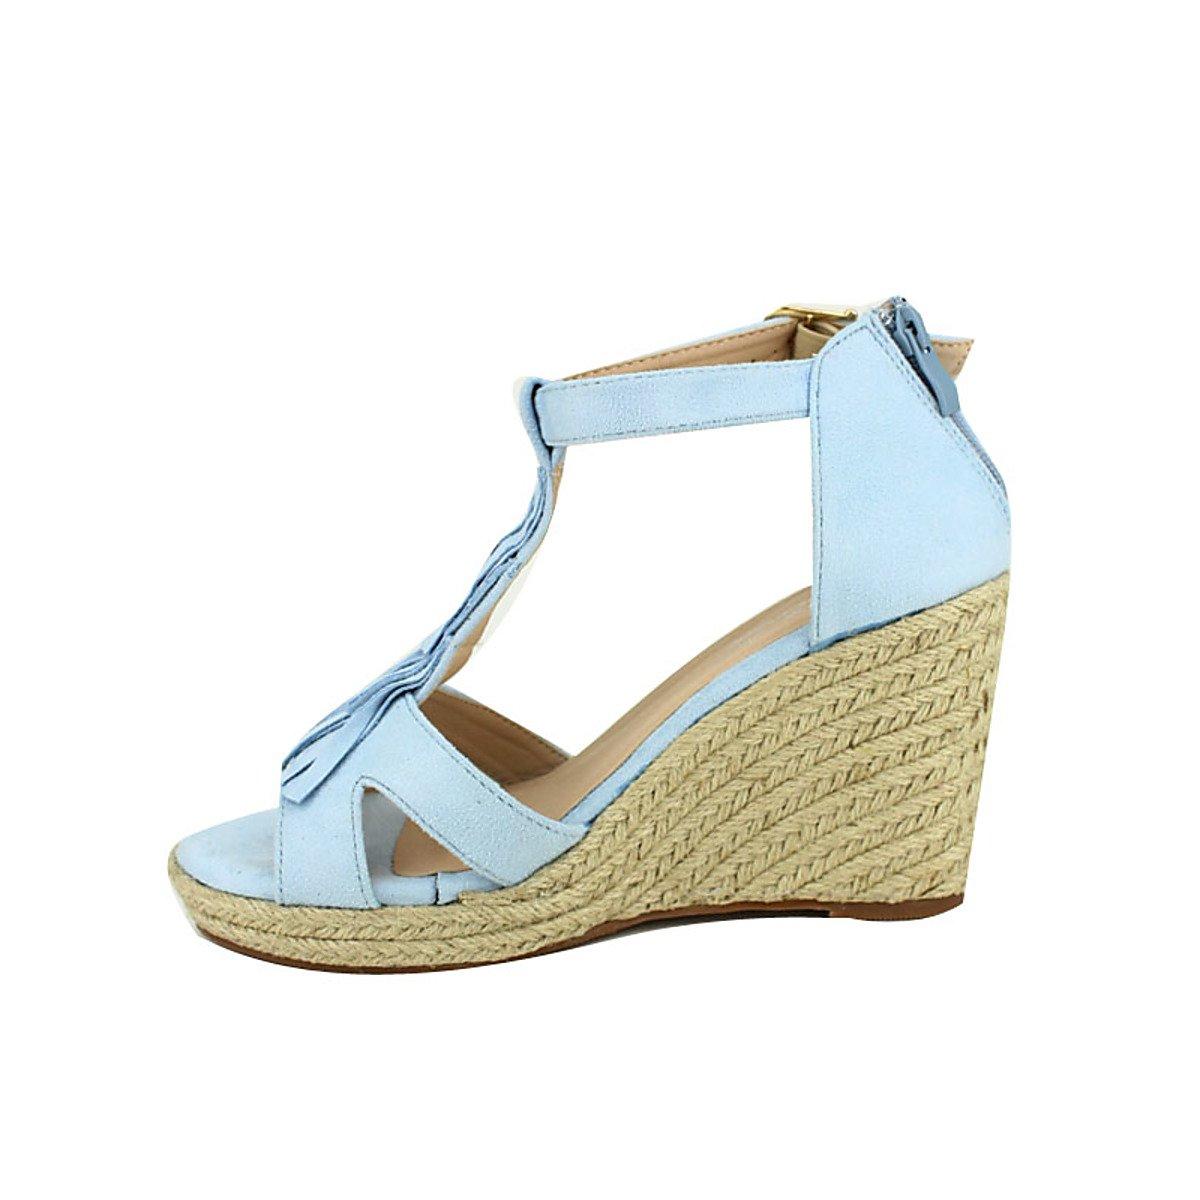 b1aea77a5dcee4 Chaussures Cendriyon Compensée Bleue à Franges CINKS Chaussures Femme  Compensée Bleue à Franges CINKS Chaussures Femme ...